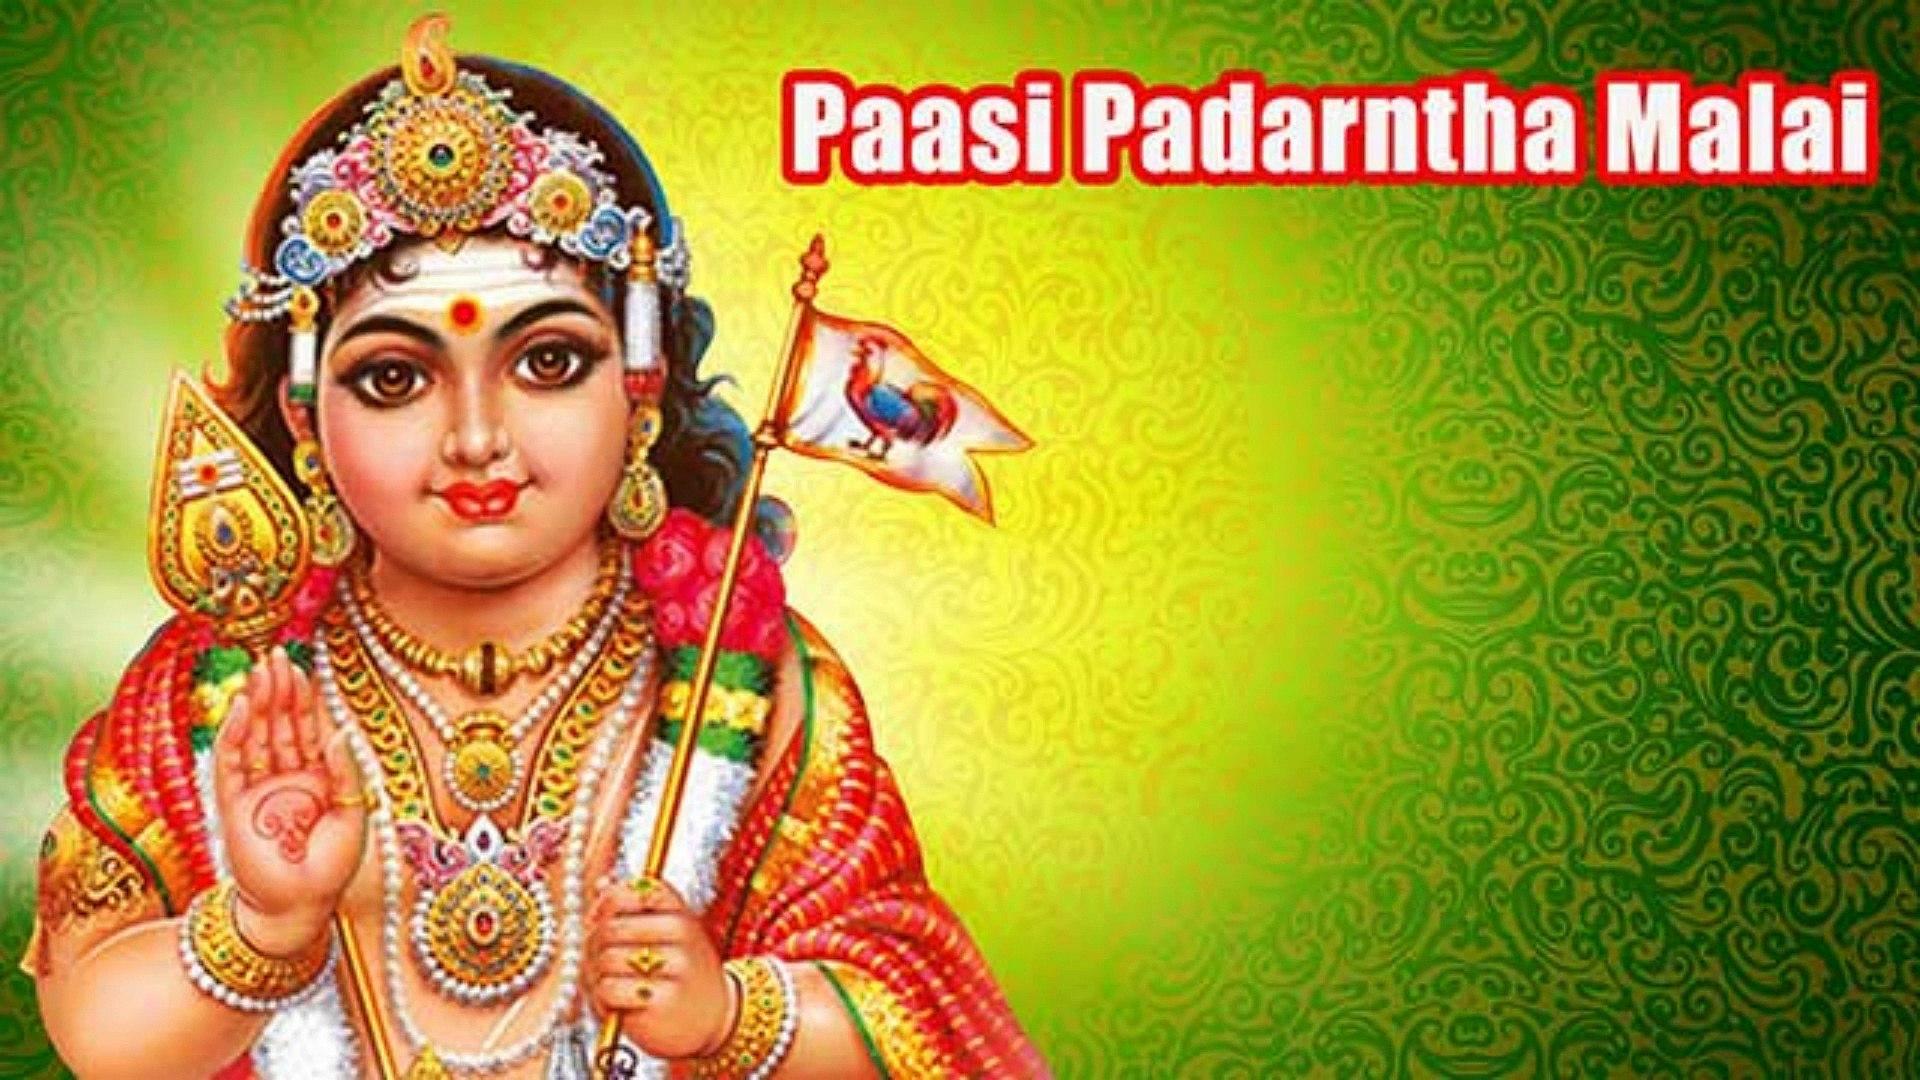 Paasi Padarntha Malai - Lord Murugan Tamil Devotional Songs ¦ Latest Tamil Devotional Songs